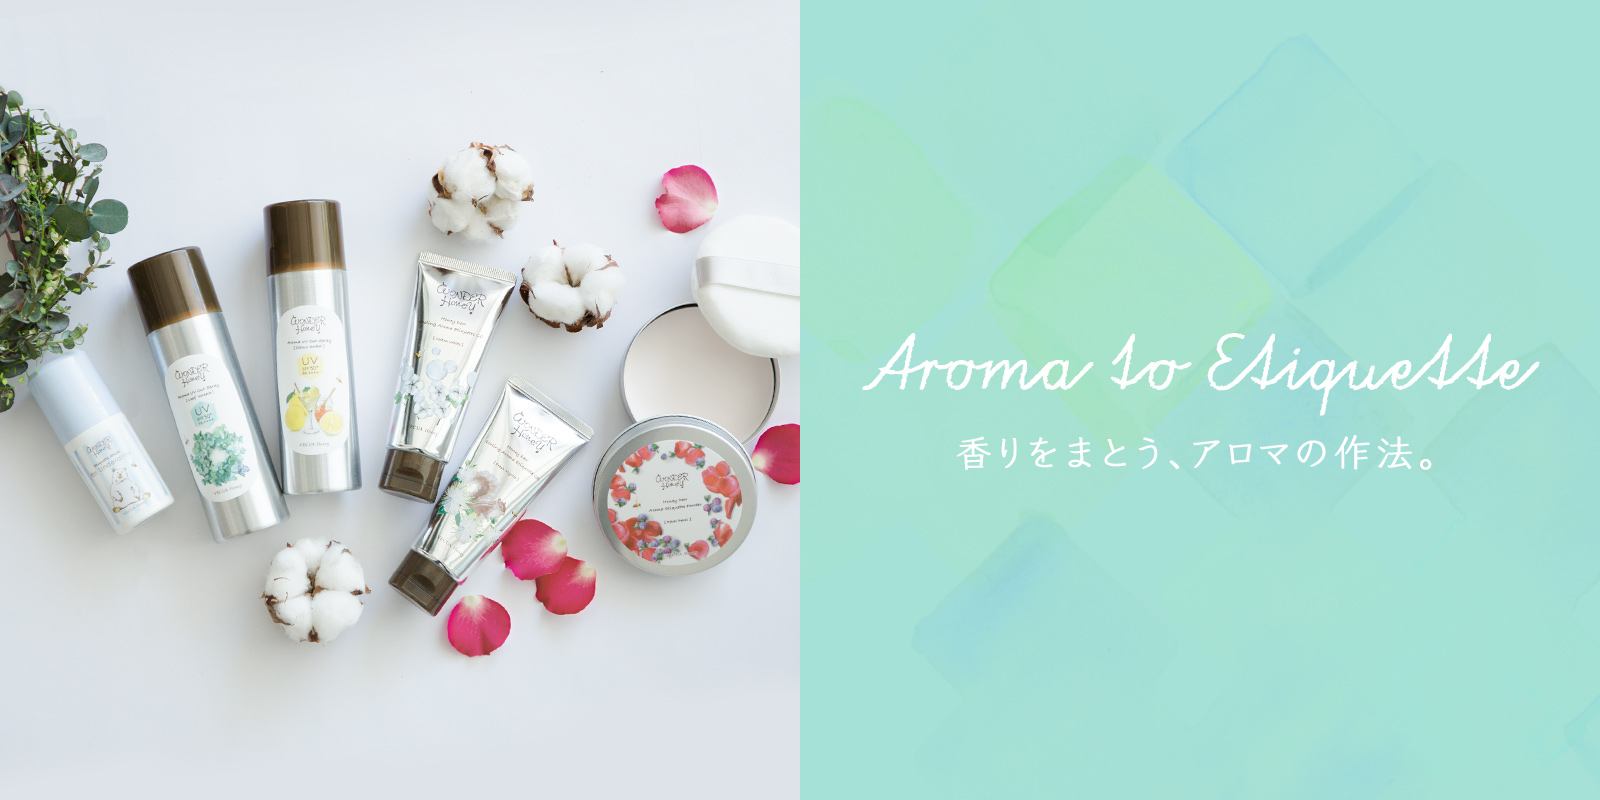 Aroma to Etiquette 香りをまとう、アロマの作法。